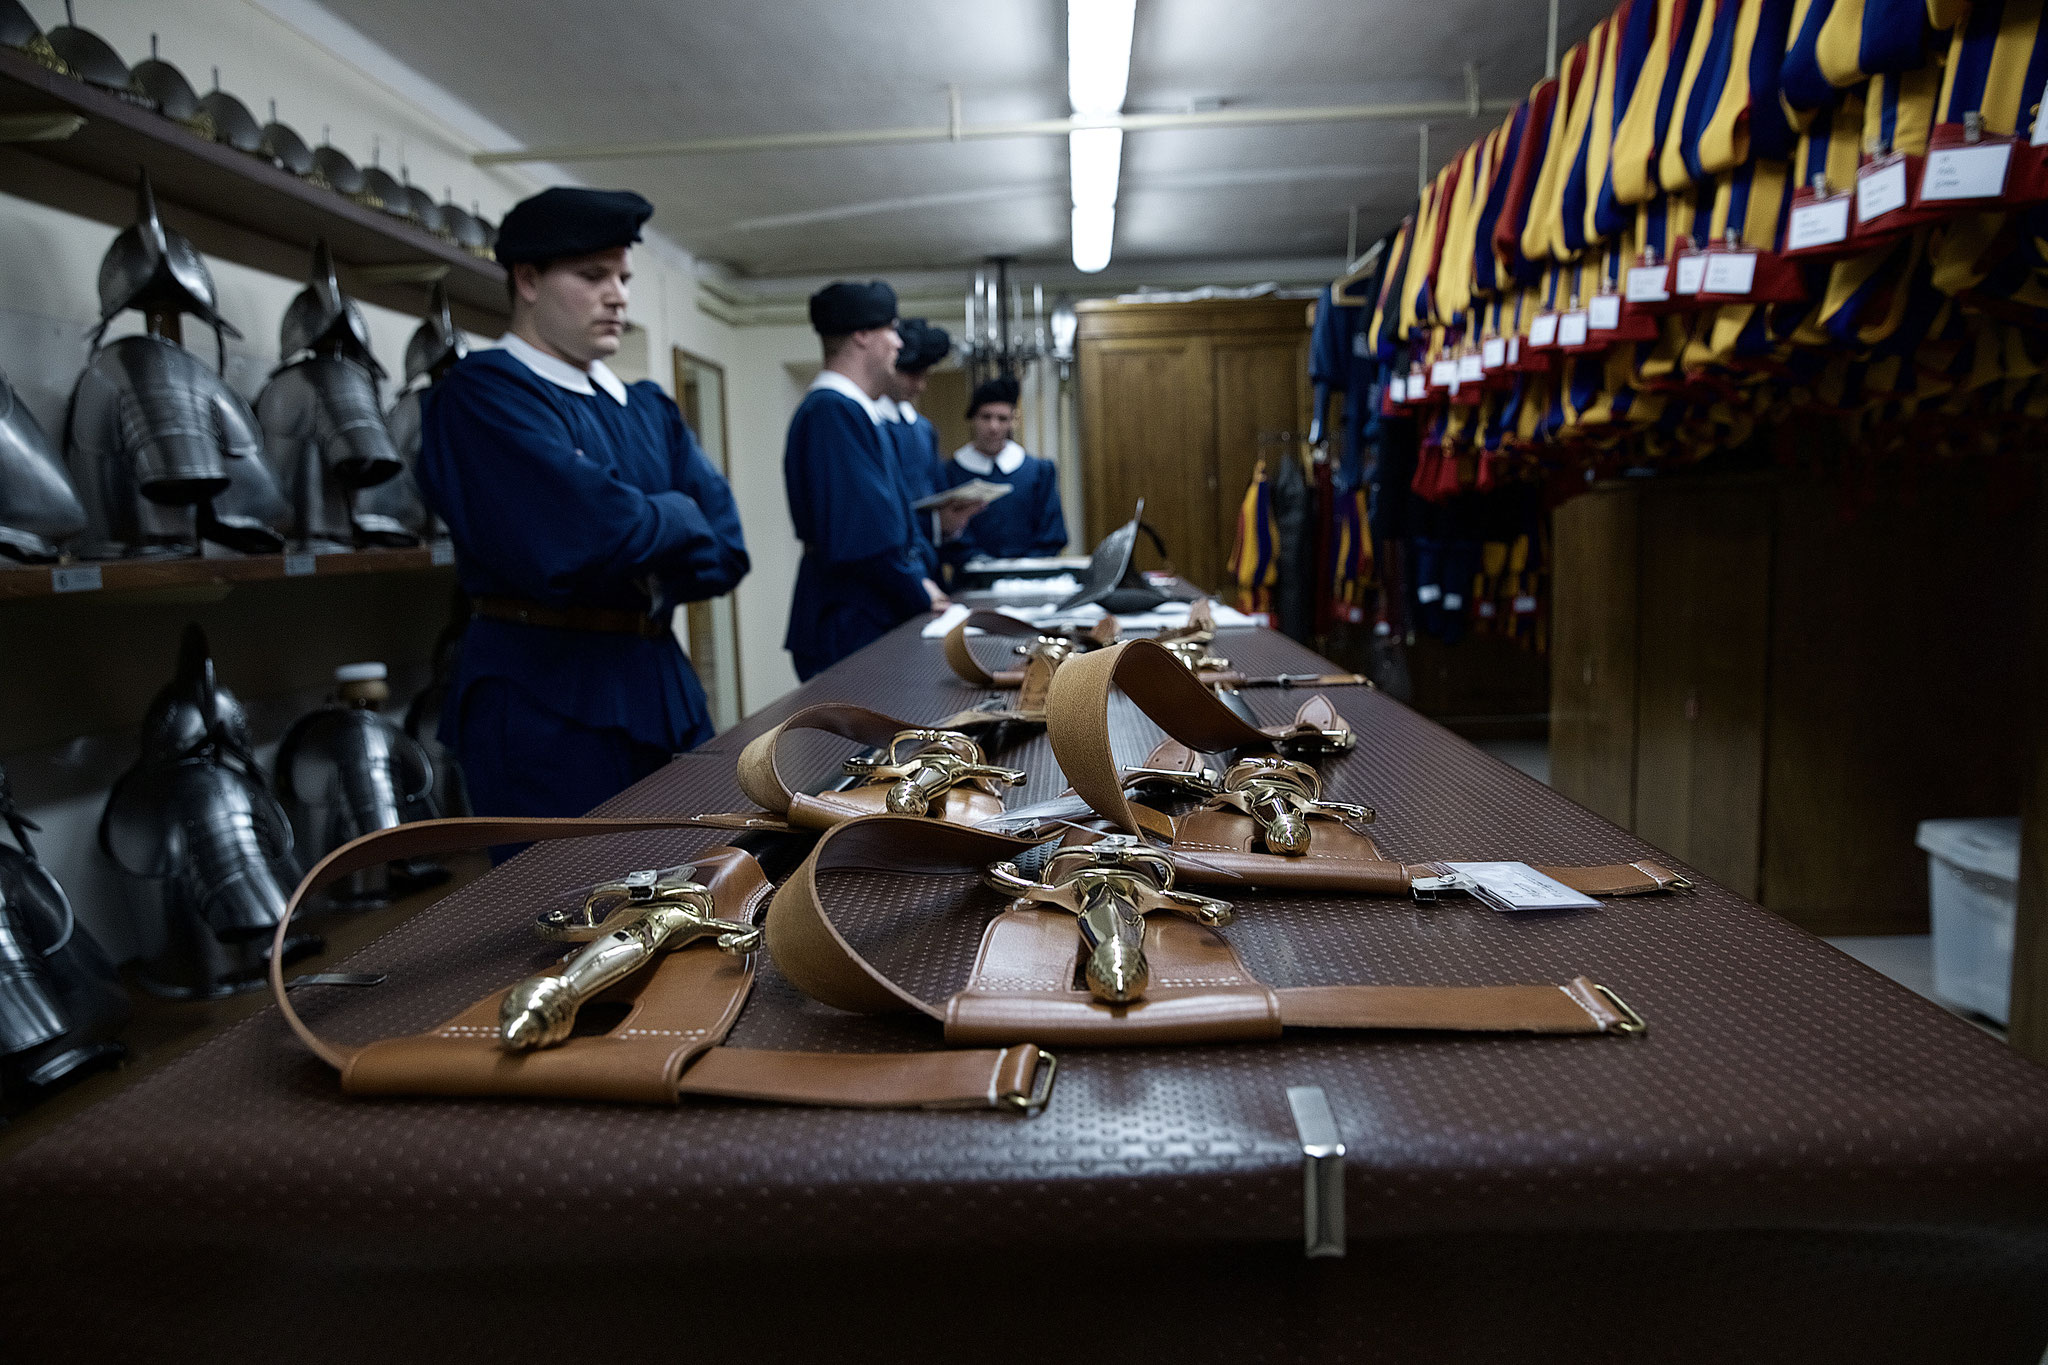 Receiving the Gala Uniform and sword.